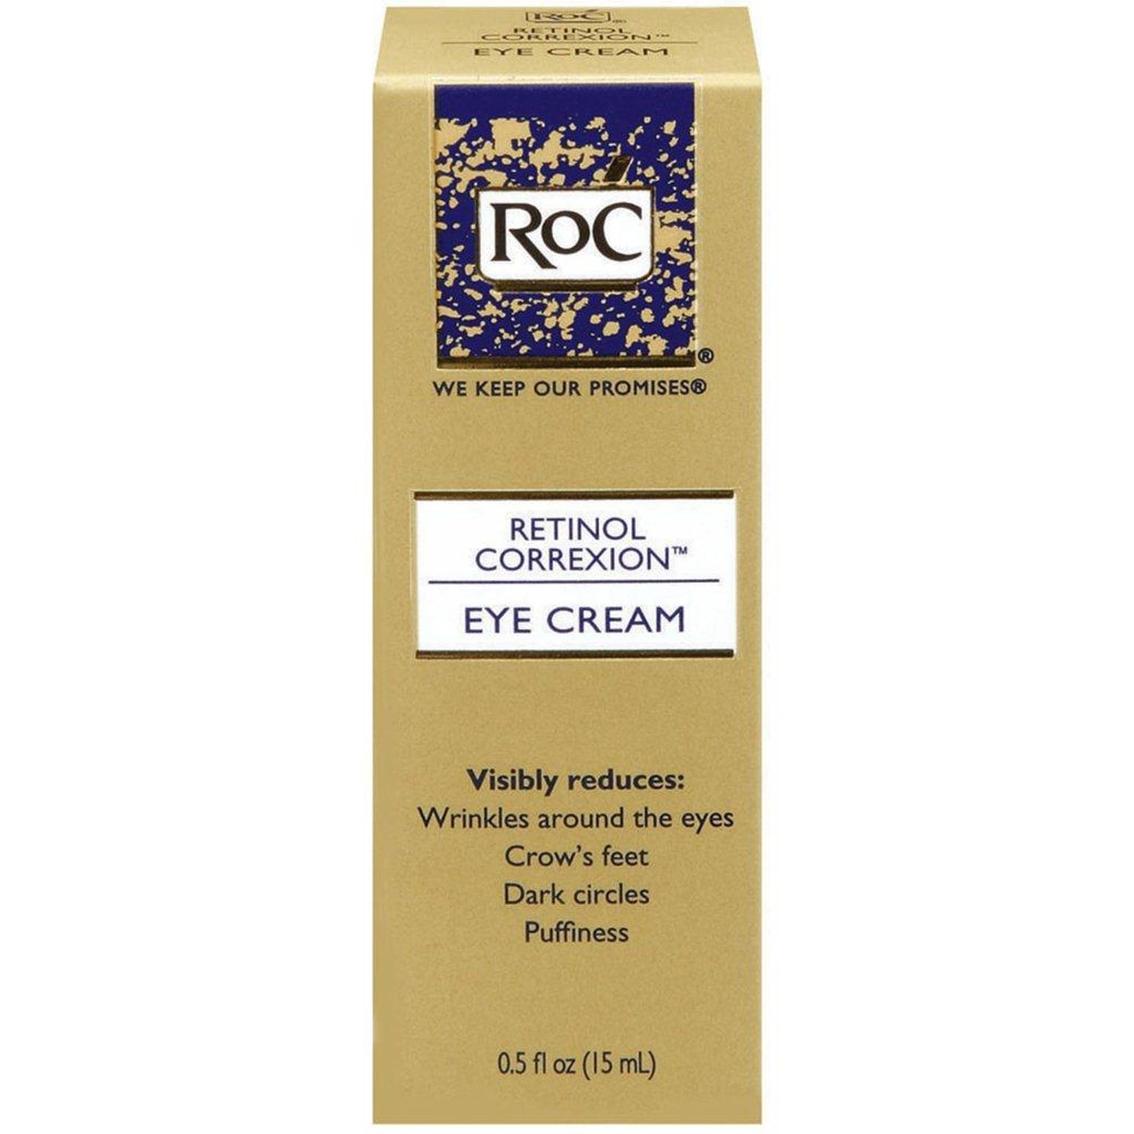 Roc Retinol Correxion Eye Cream 0 5 Oz Eye Treatment Beauty